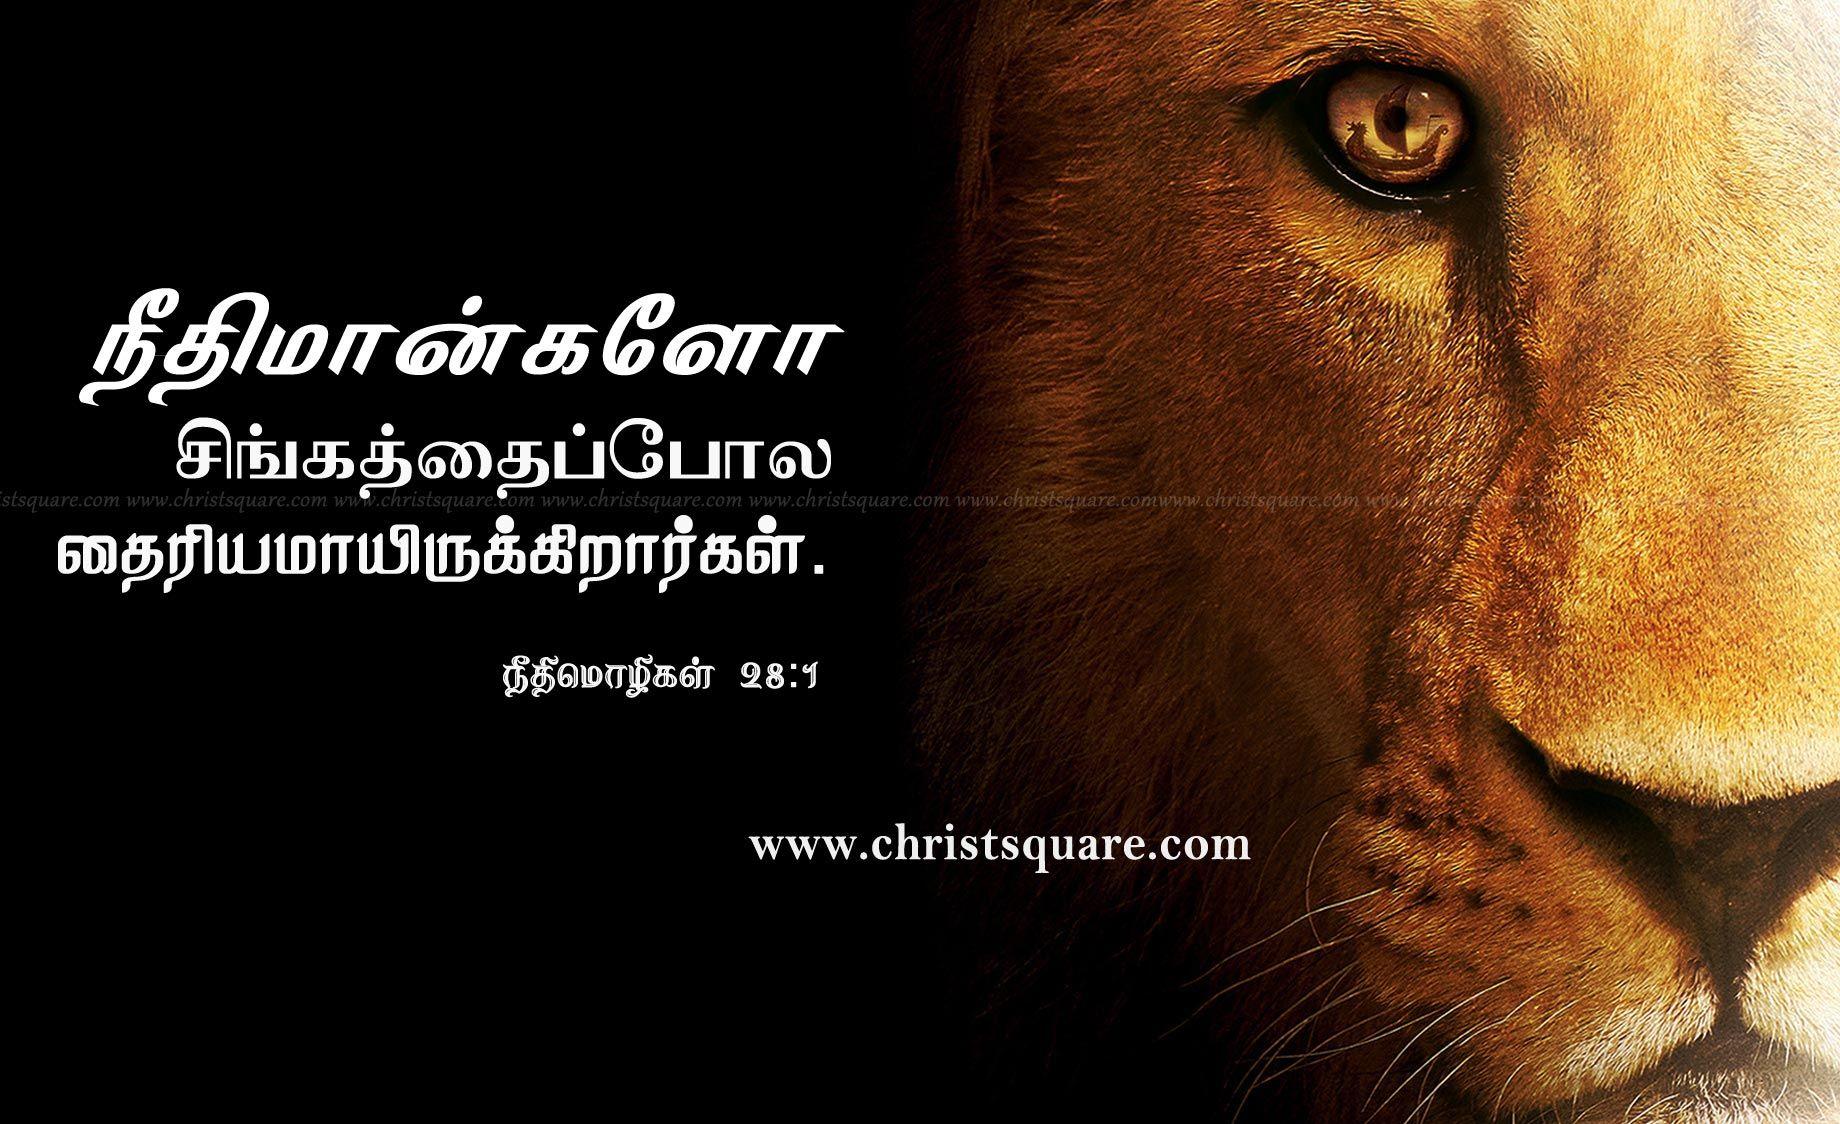 tamil christian wallpaper hd, mobile christian wallpaper, desktop